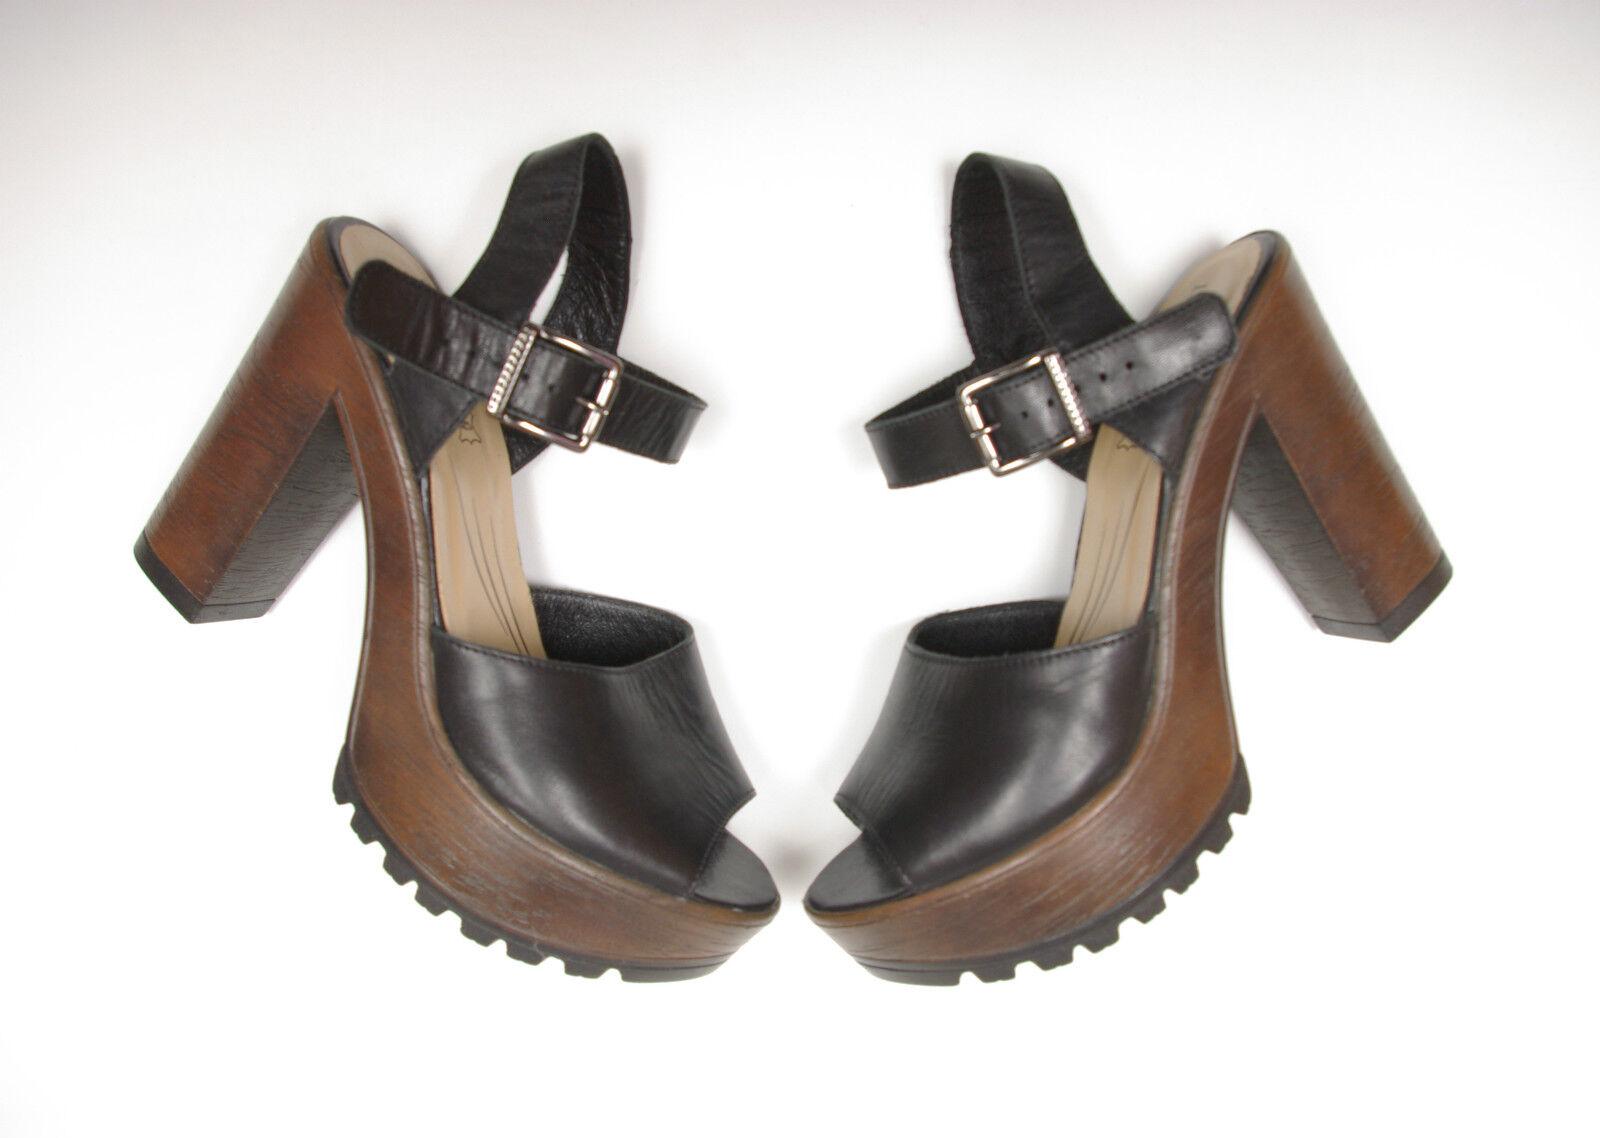 P671 55 Lasocki Leather Black Hills Sandals size 38 UK 5